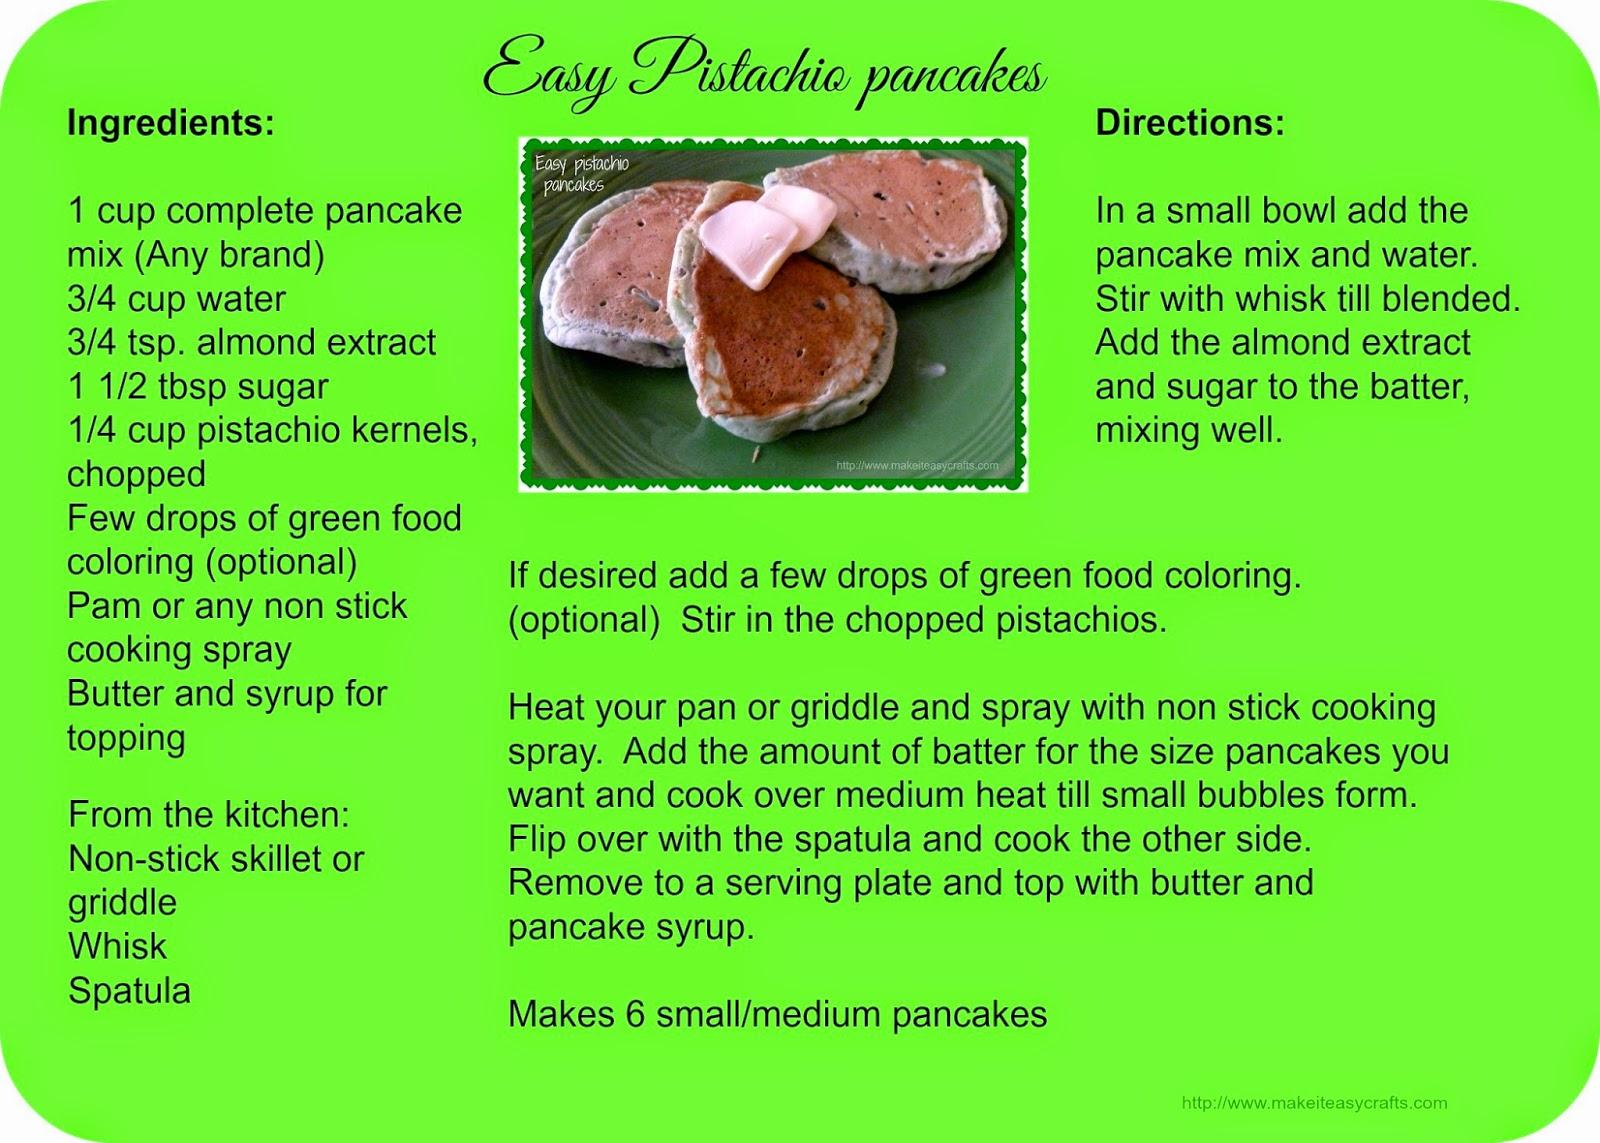 Pistachio pancake recipe card